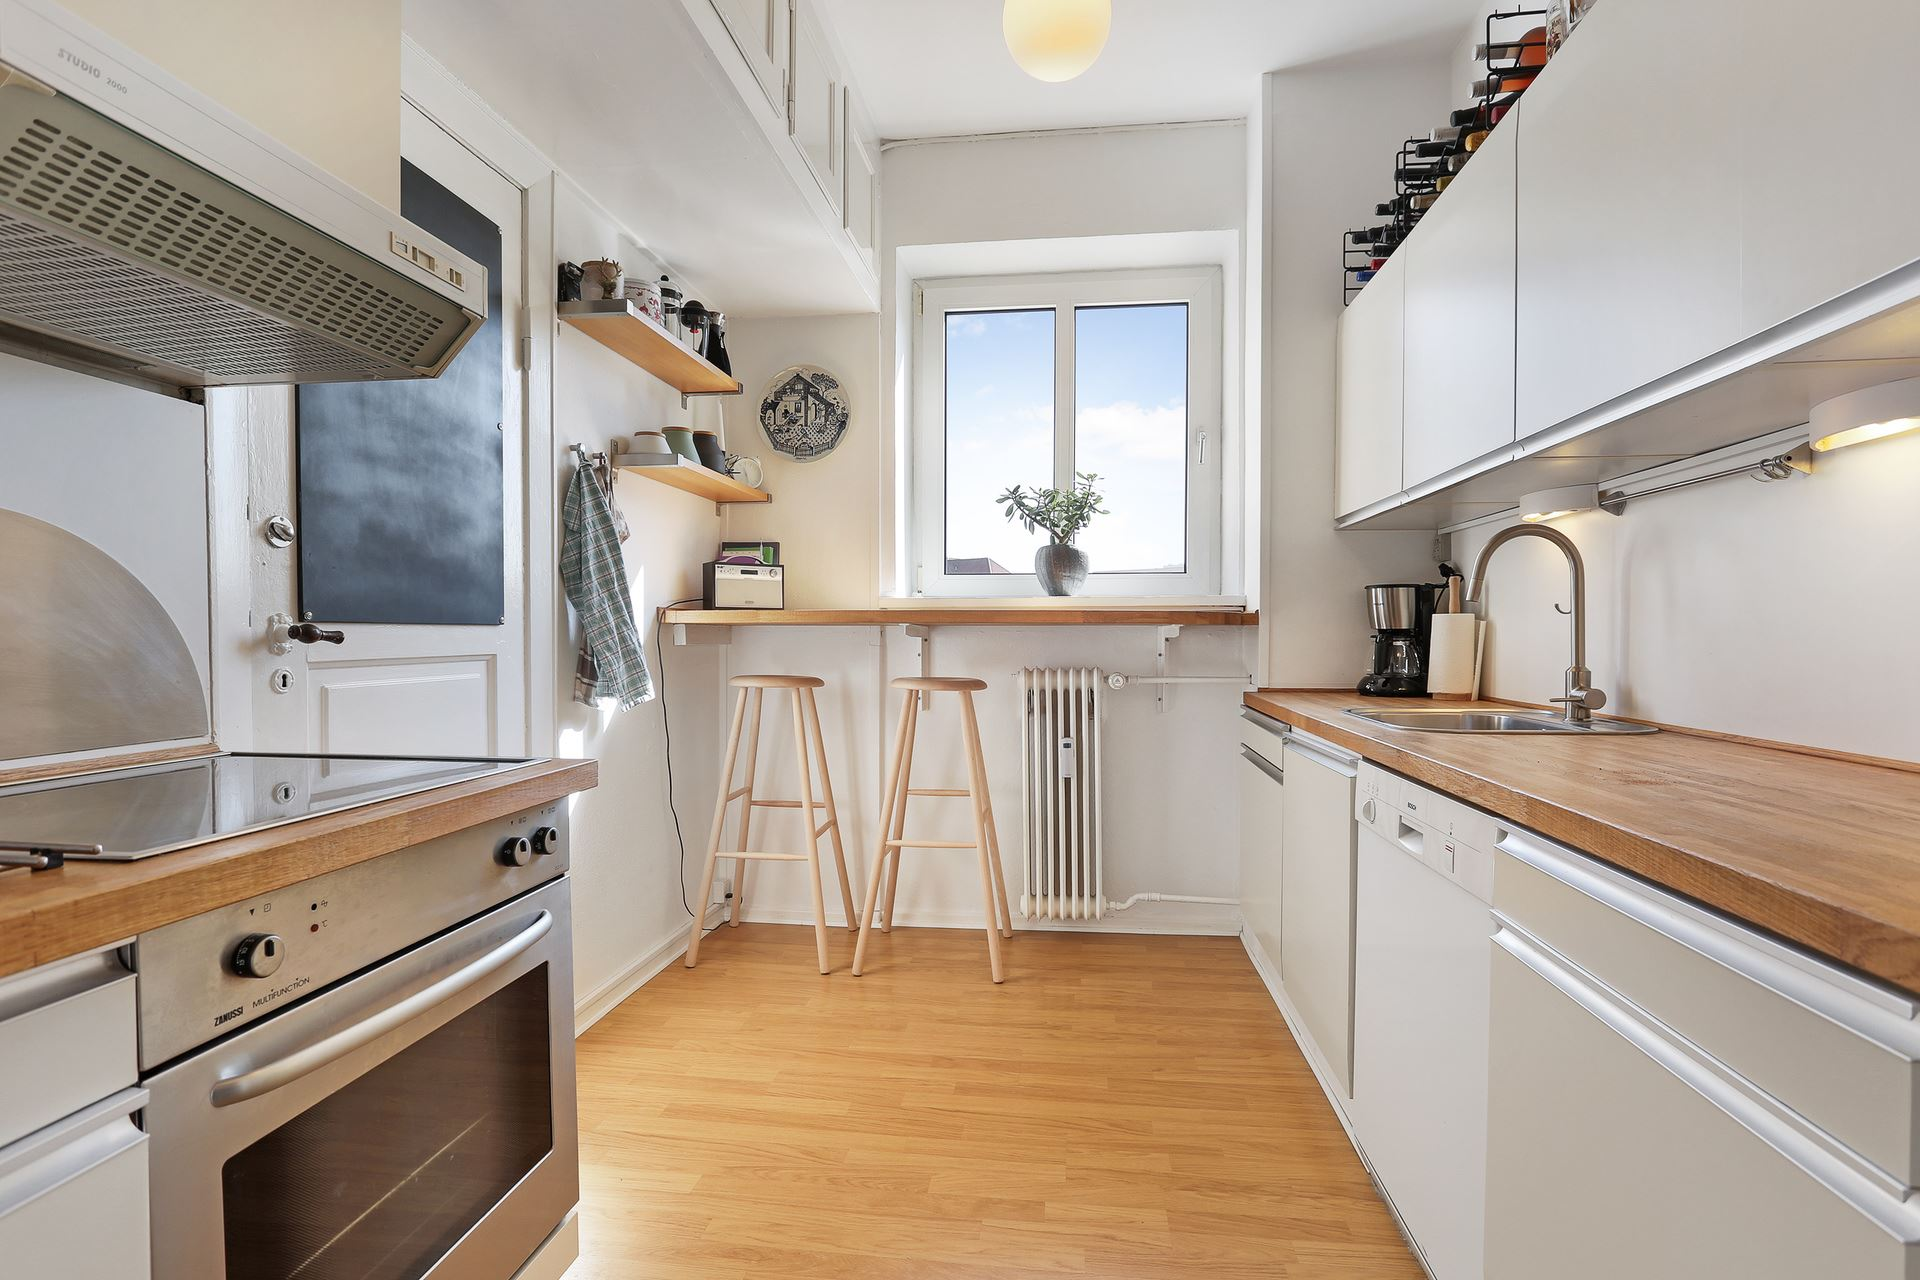 Vesterbro 24 1 th, 9000 Aalborg